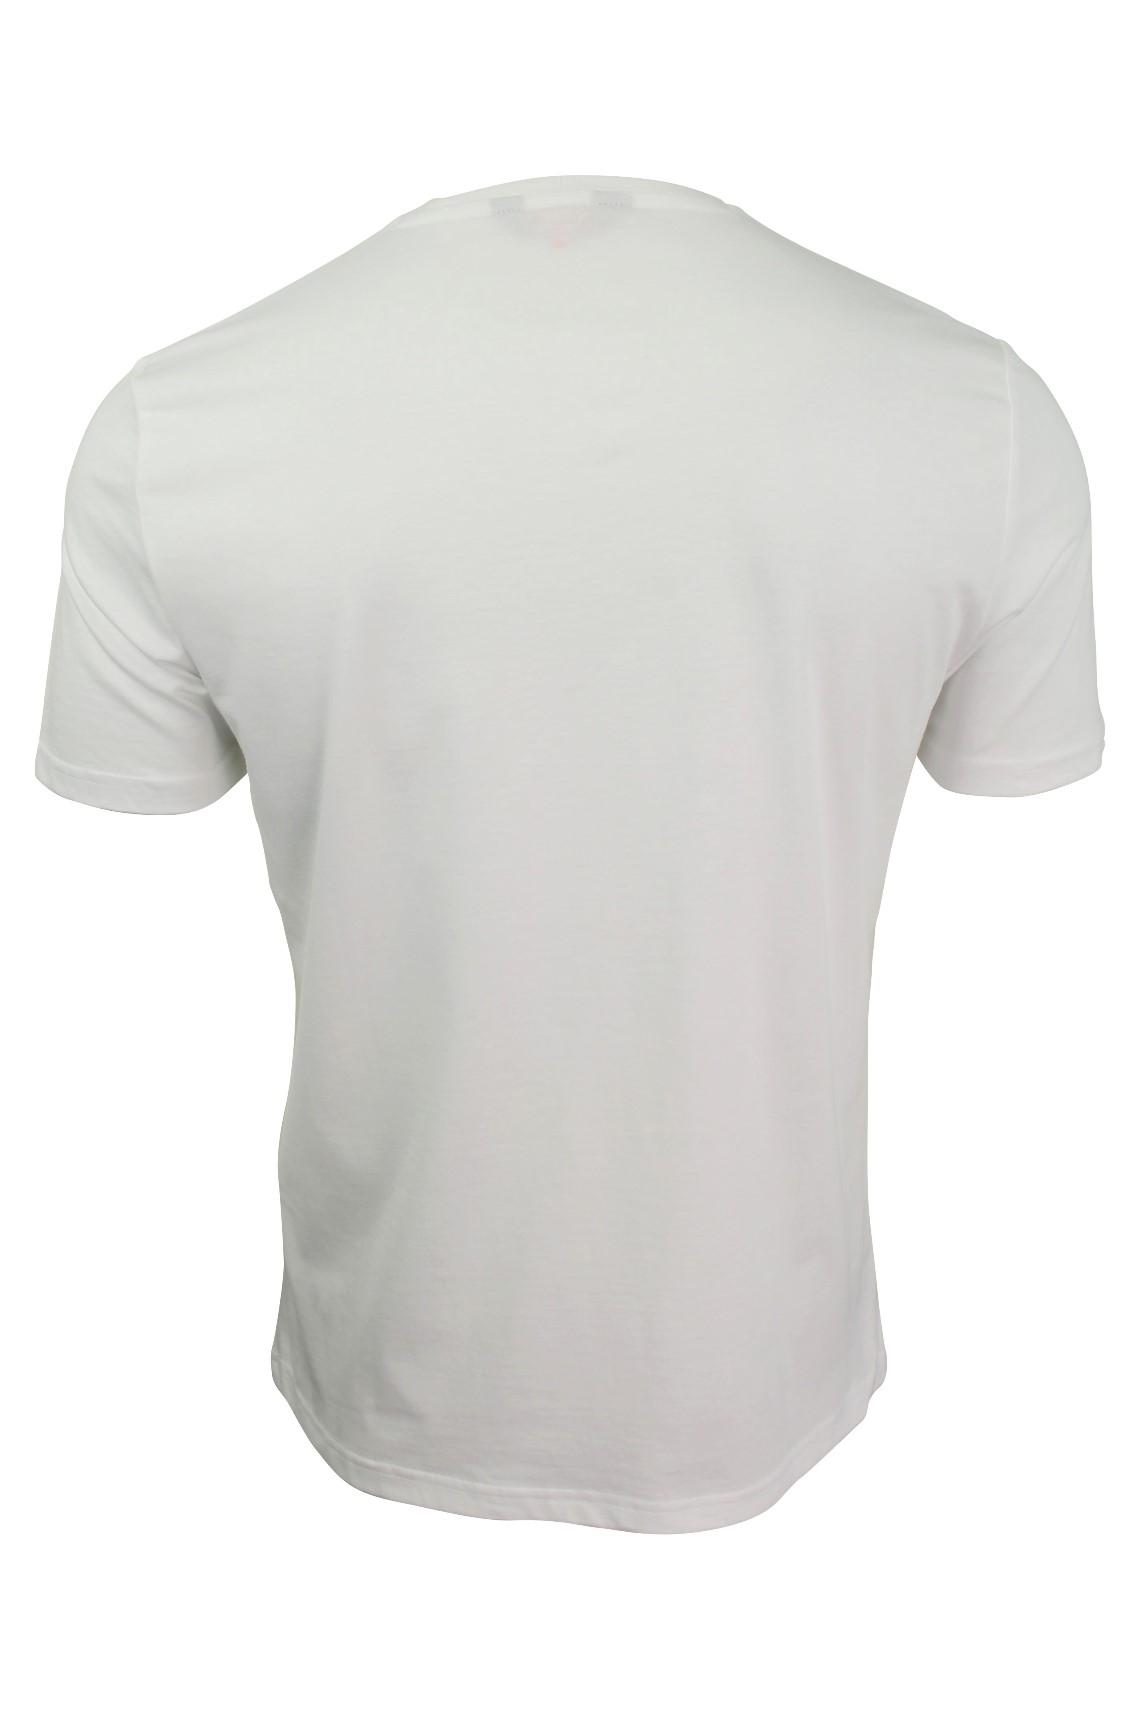 Mens-Classic-Spade-Pocket-T-Shirt-by-Ben-Sherman thumbnail 34